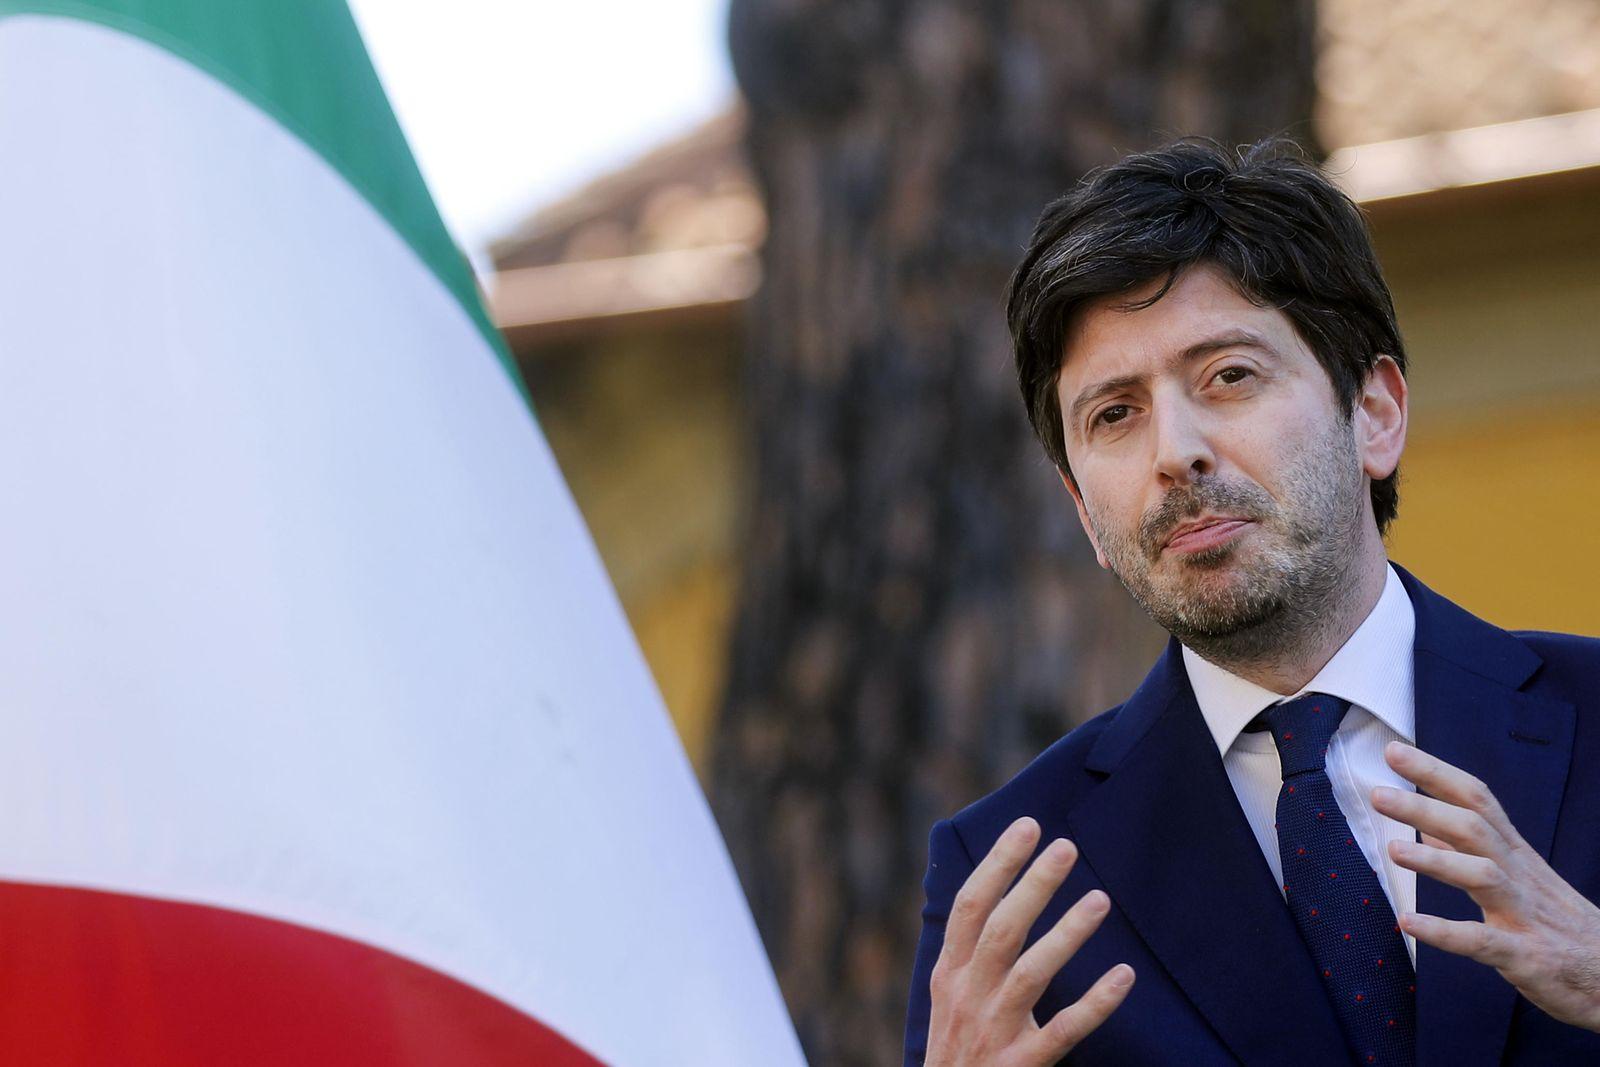 US Ambassador to Italy Lewis Eisenberg visits Rome - 22 Jun 2020